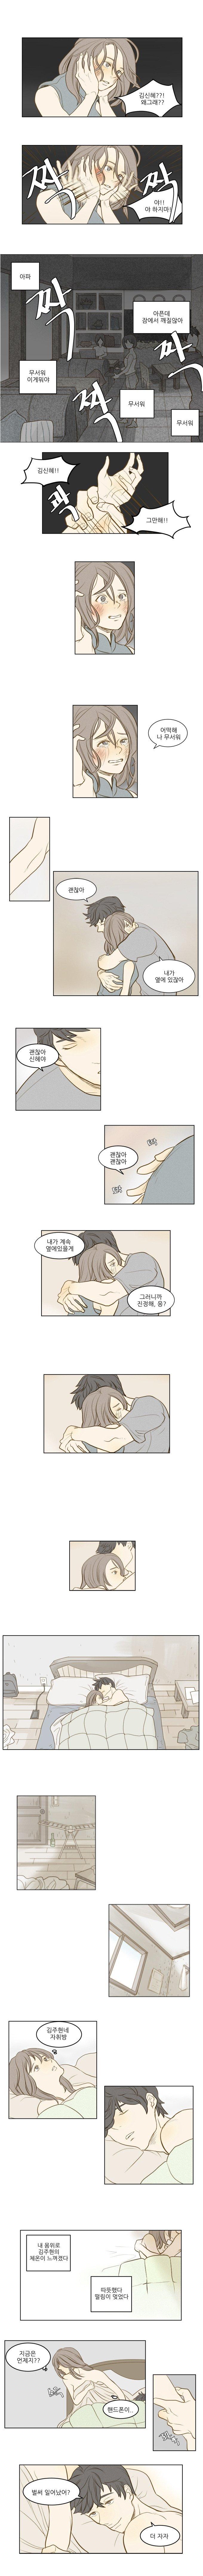 4.jpg 시간은 거꾸로 흐른다.manga [BGM] 시간은 거꾸로 간다.manhwa